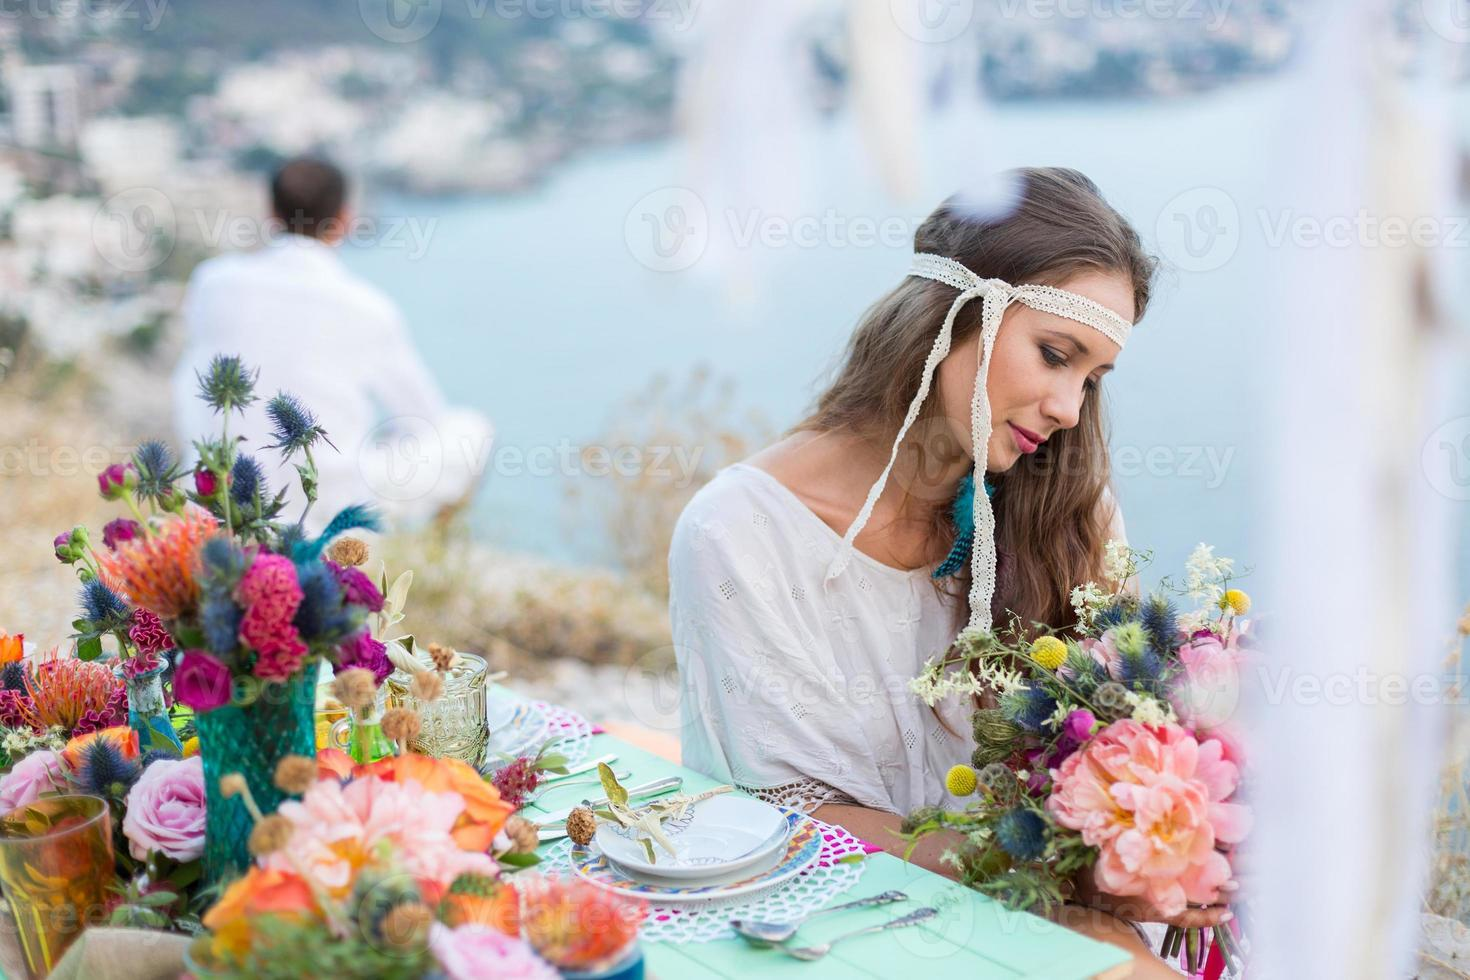 chica con un ramo de novia estilo boho foto